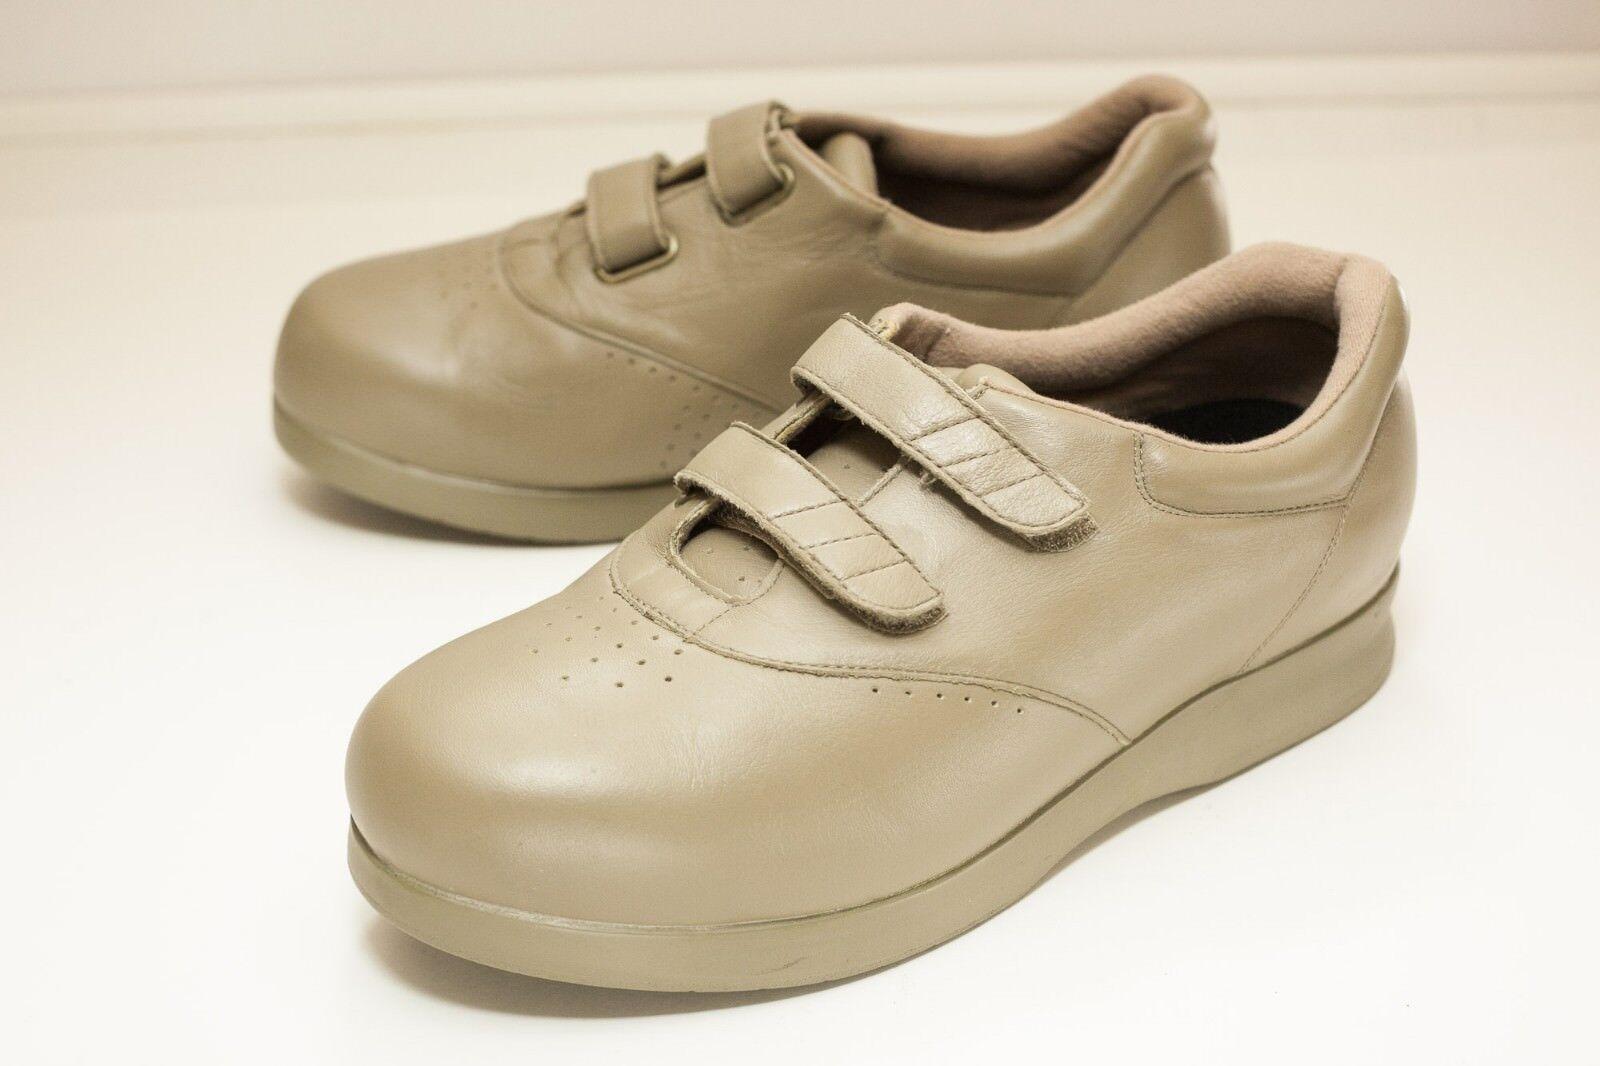 Drew Paradise Size 9WW Taupe Women's shoes